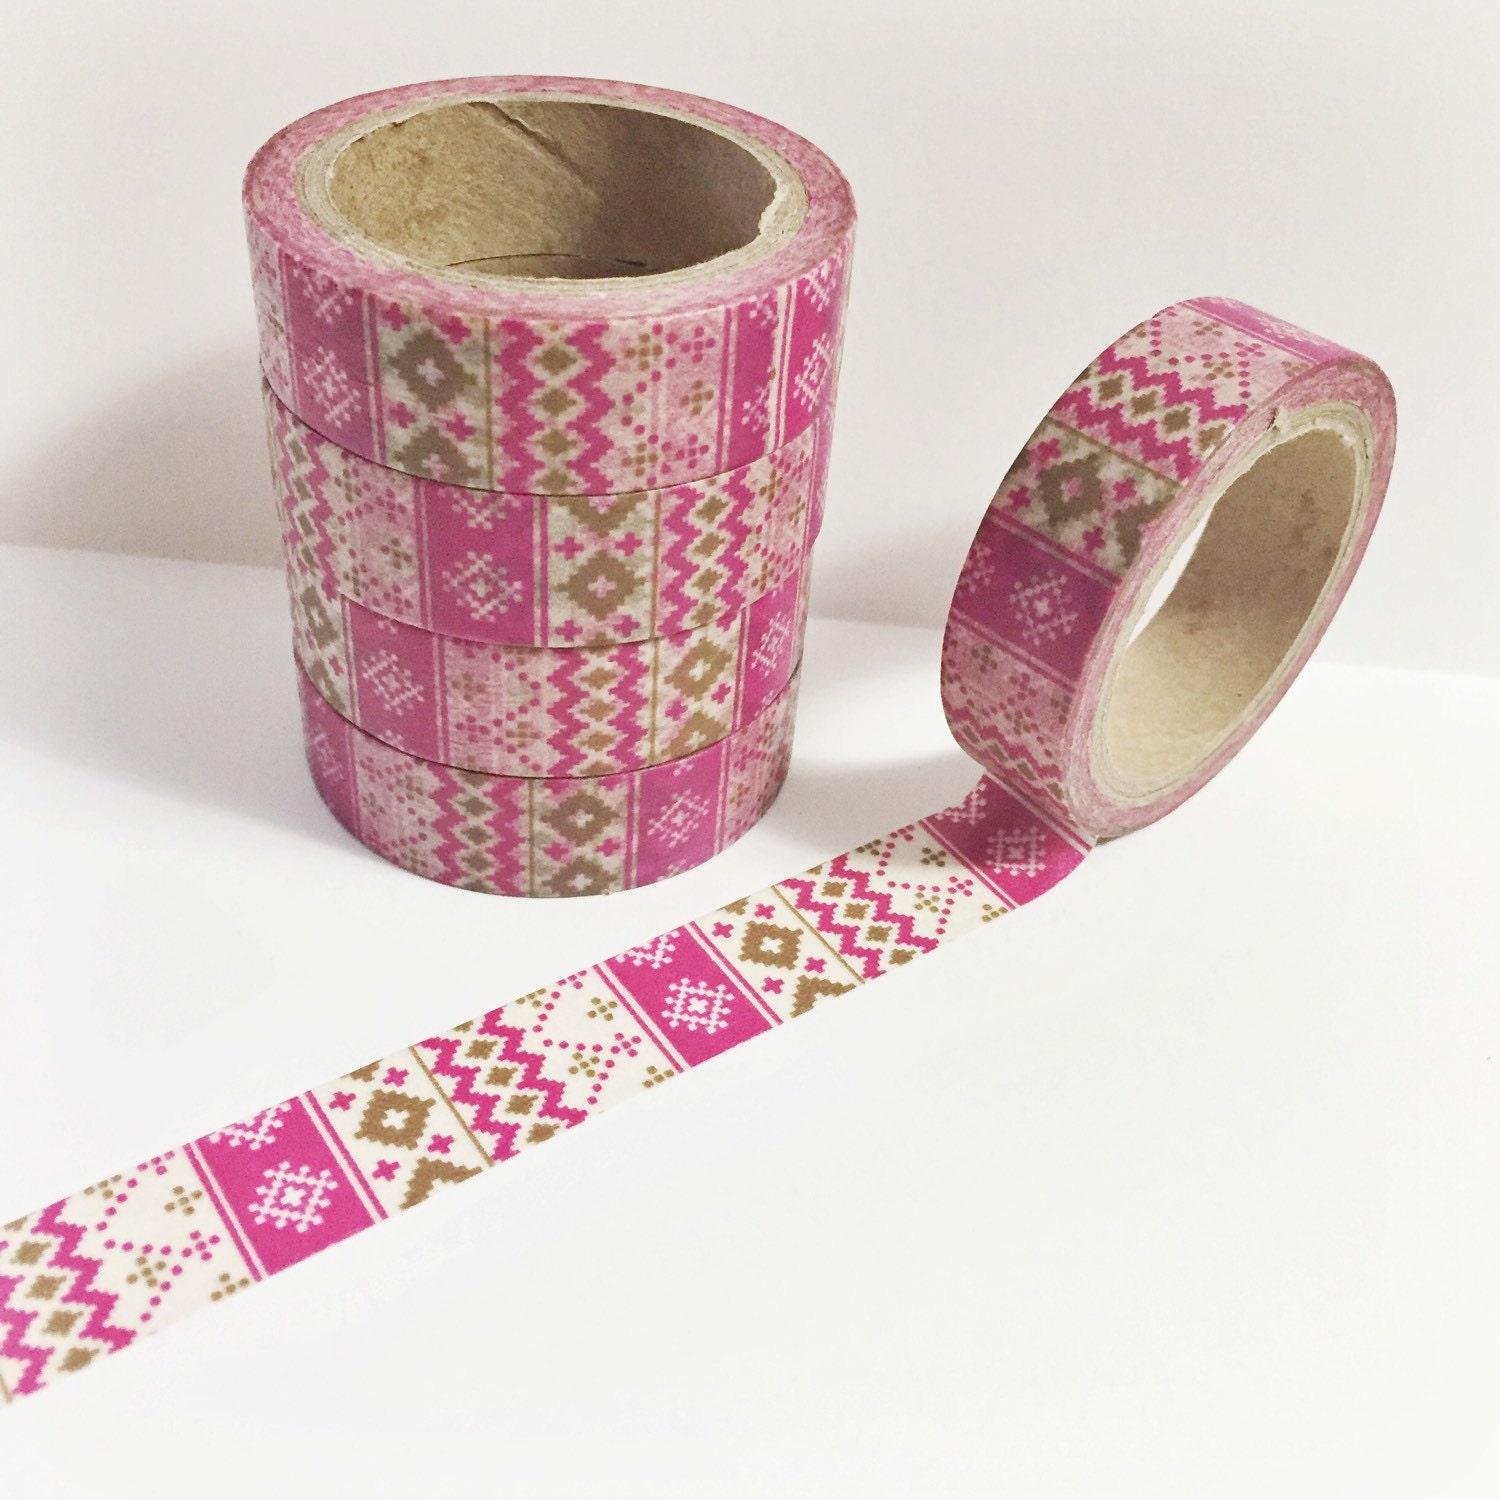 Stitched check pink and fuchsia